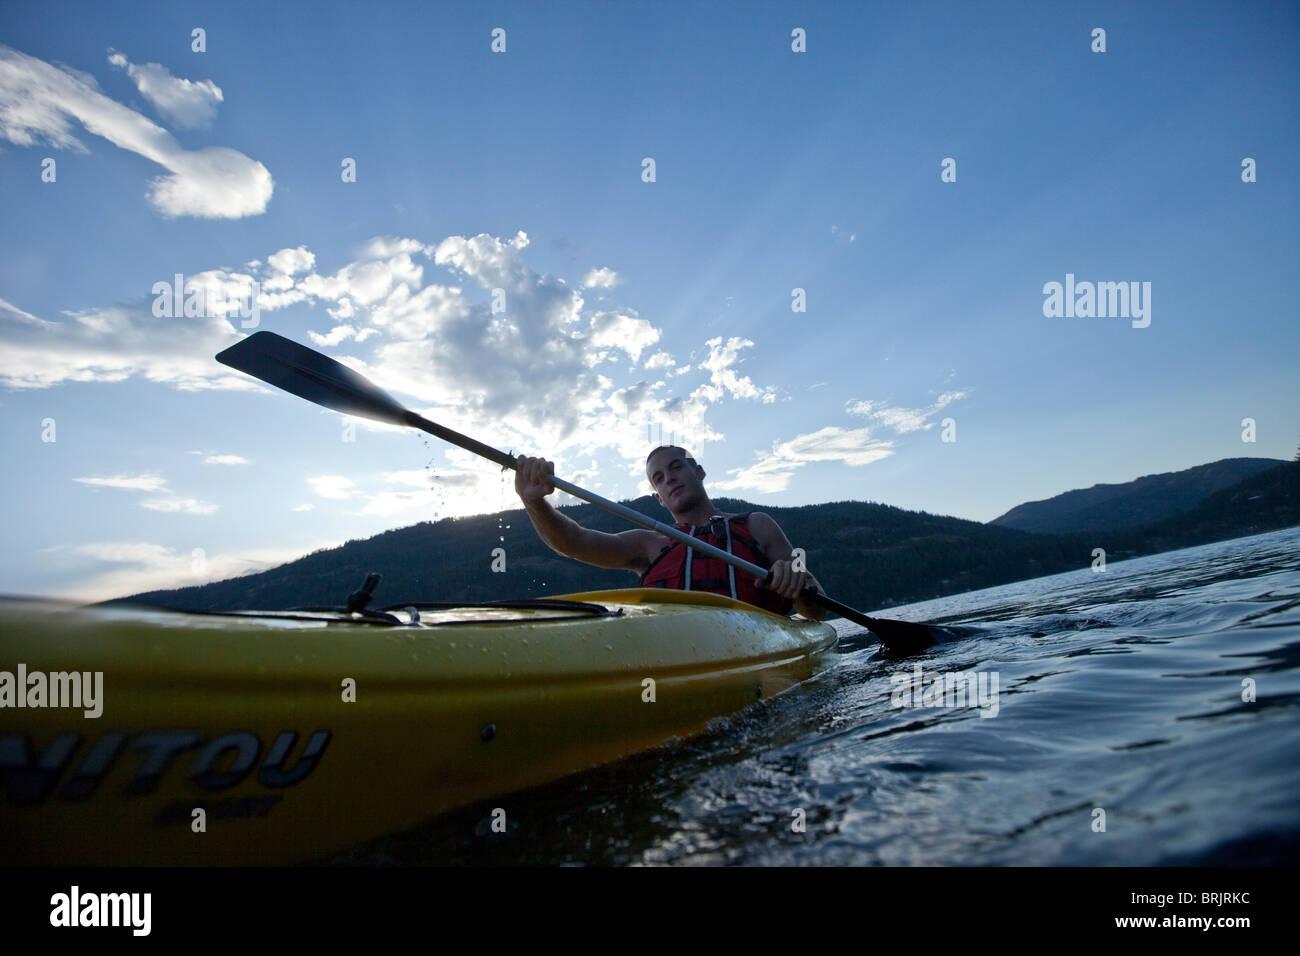 Giovane uomo Pale yellow kayak sul lago. Immagini Stock